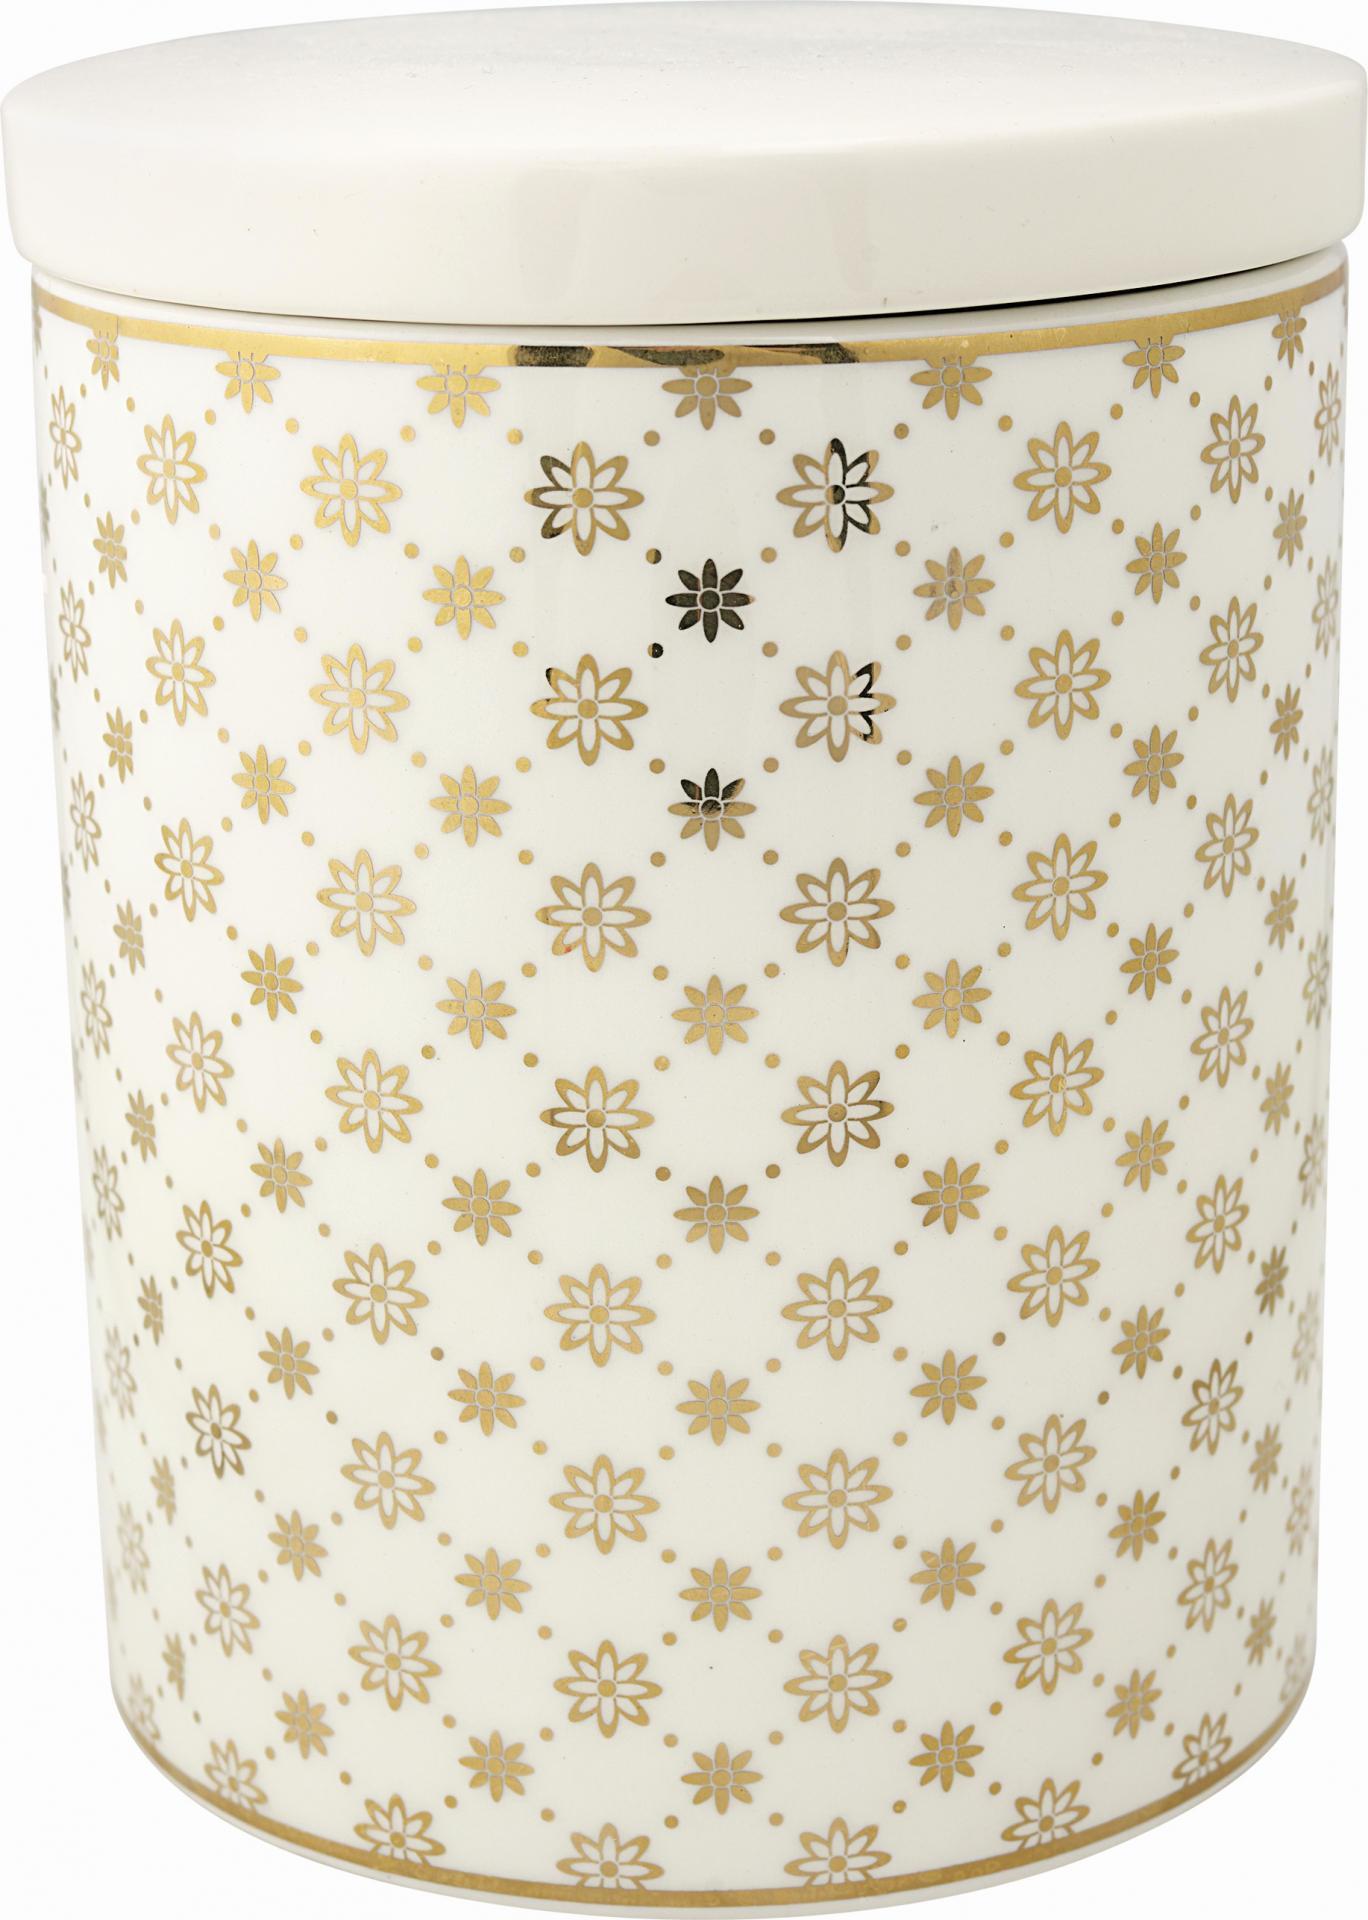 GREEN GATE Keramická dóza Laurie Gold, bílá barva, zlatá barva, keramika